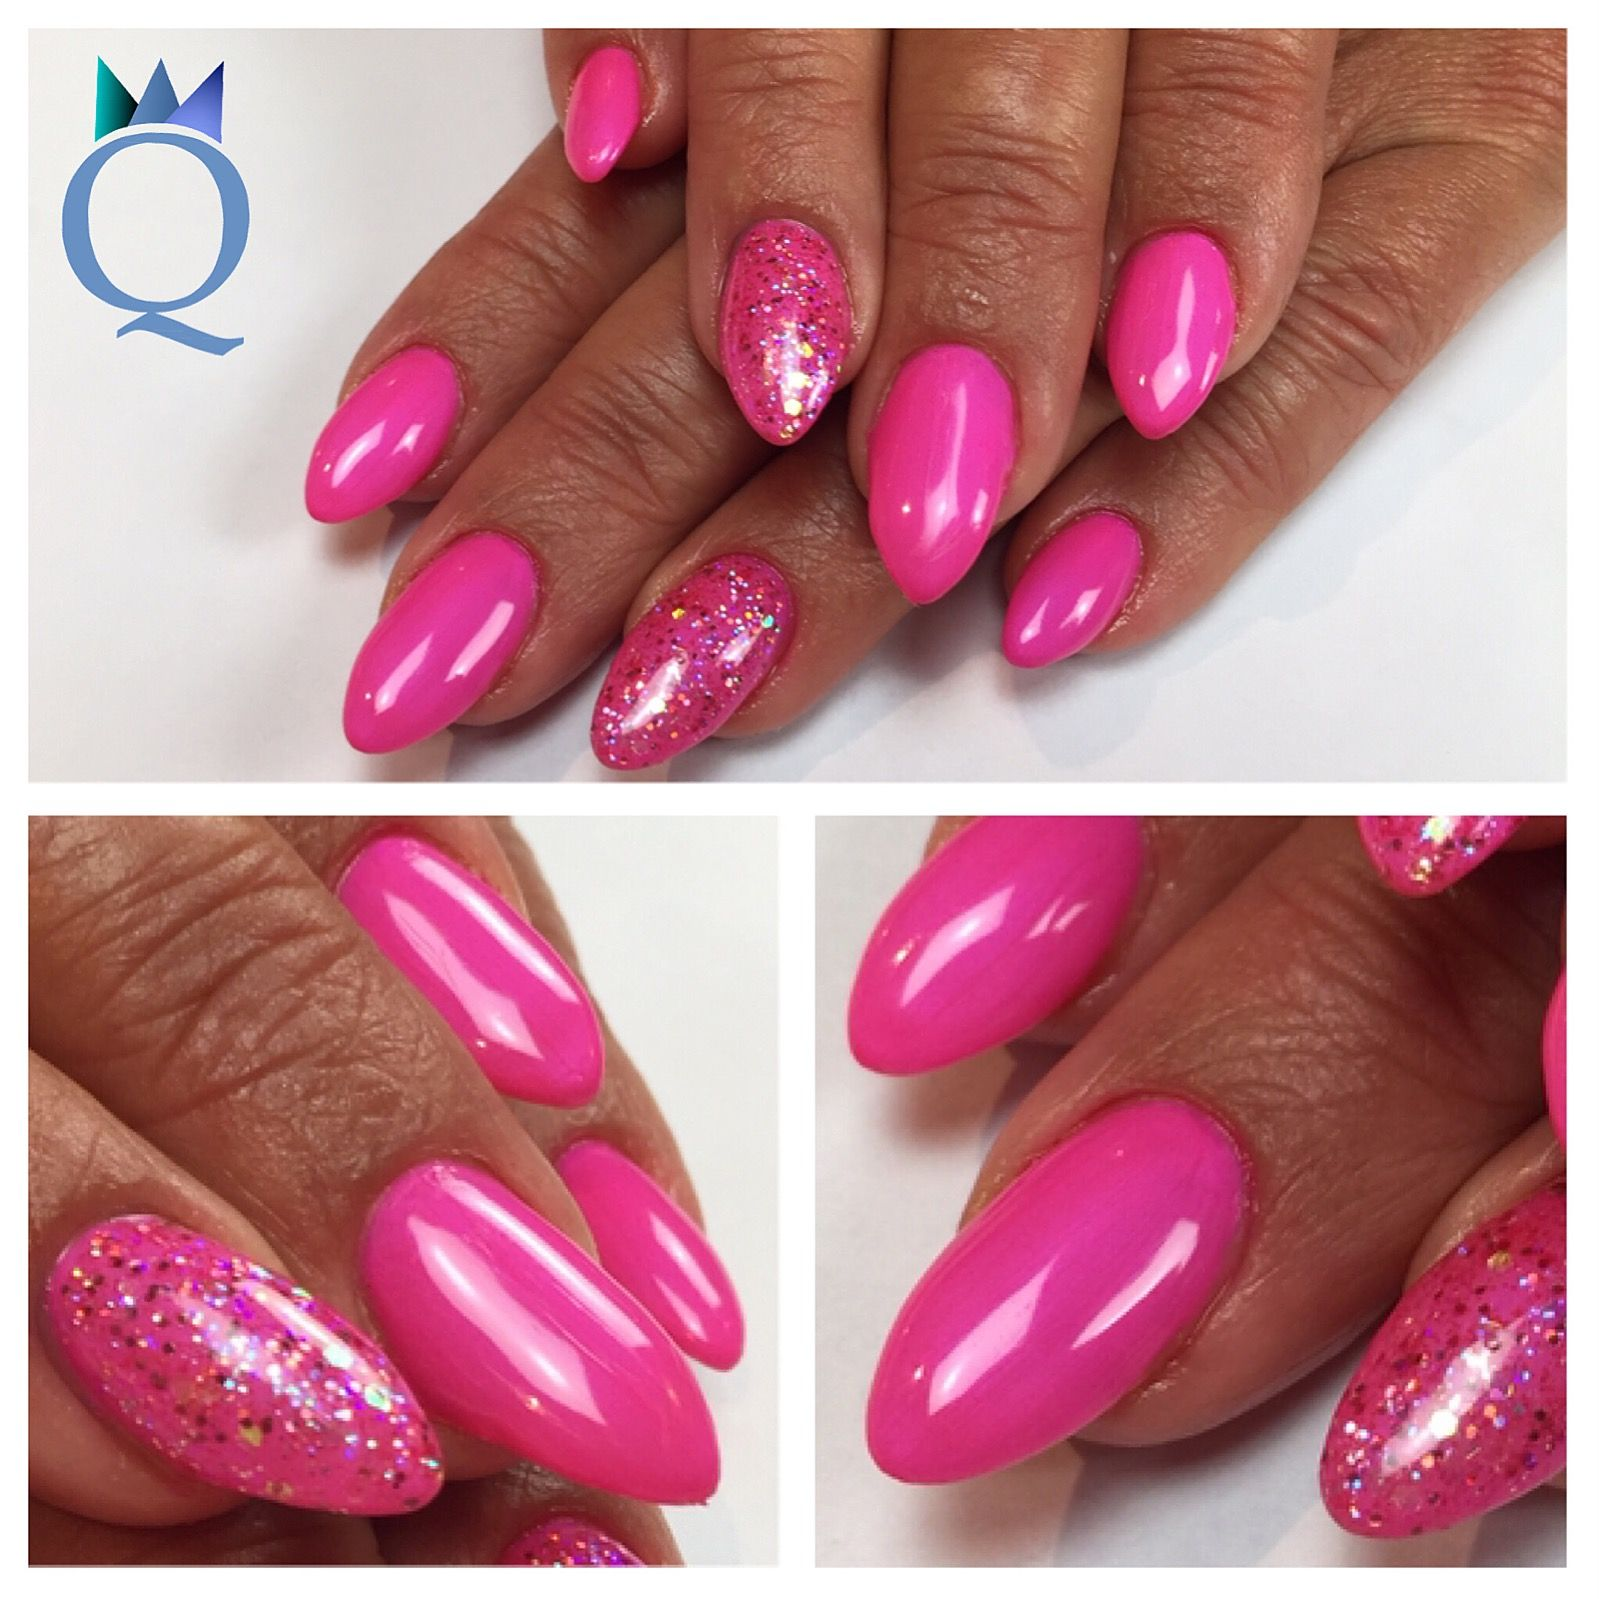 almondnails gelnails nails pink glitter akz ntz. Black Bedroom Furniture Sets. Home Design Ideas